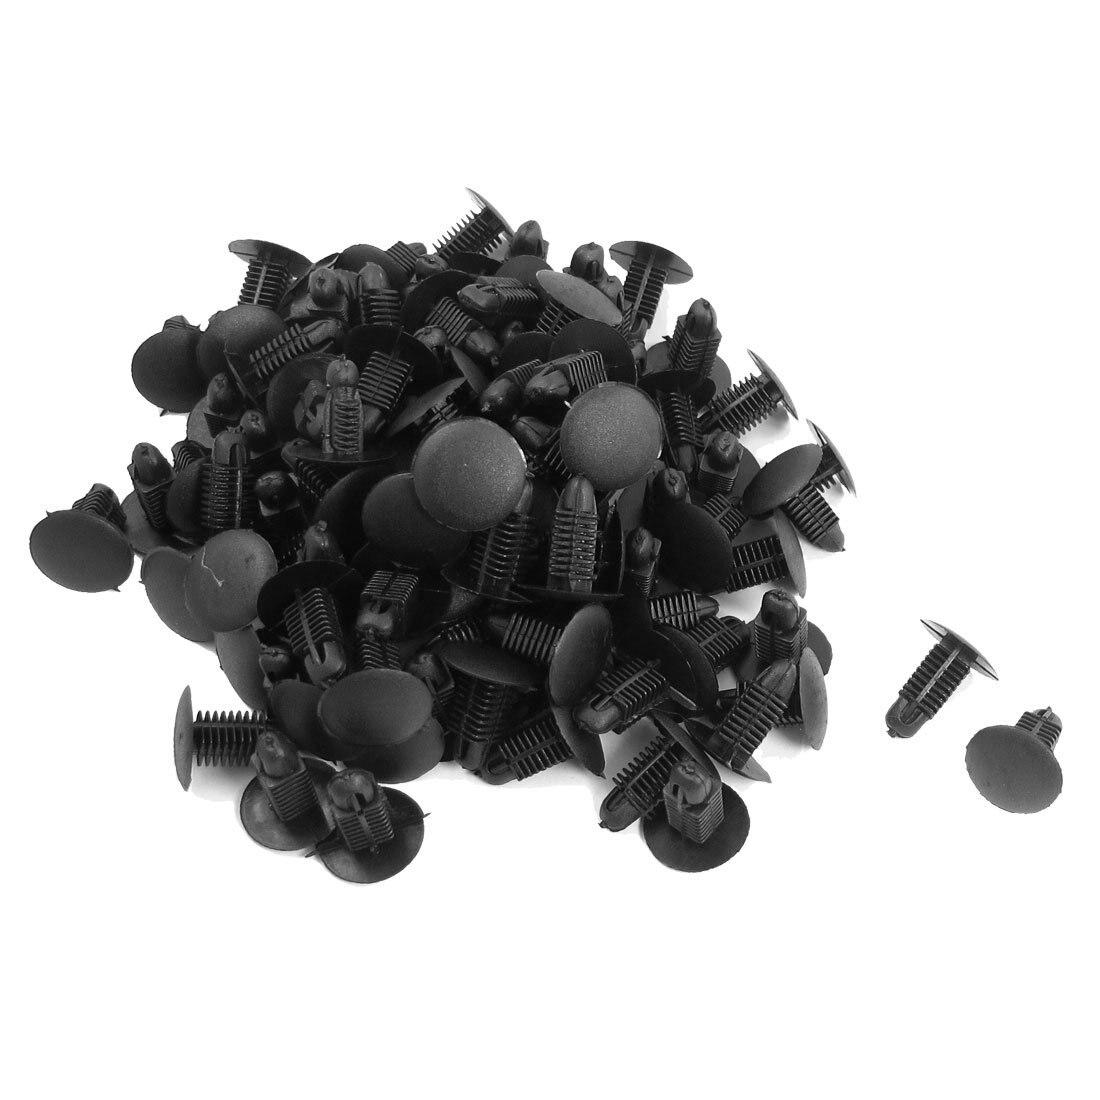 100 Pcs Car 8.6mmx8mm Hole Plastic Trim Boot Rivets Push Clip Black